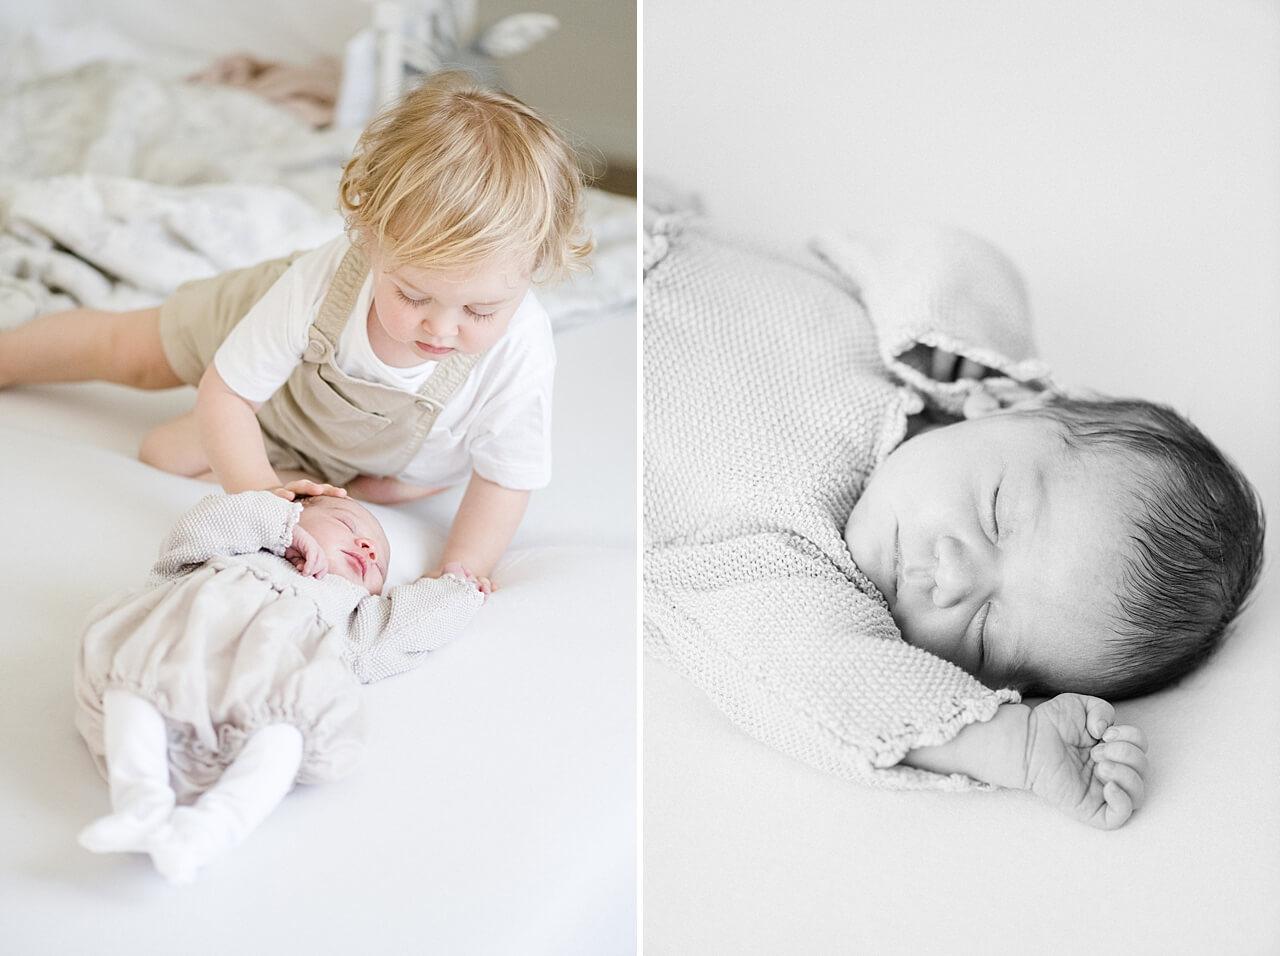 Rebecca Conte Fotografie: Zarte Neugeborenenbilder 03